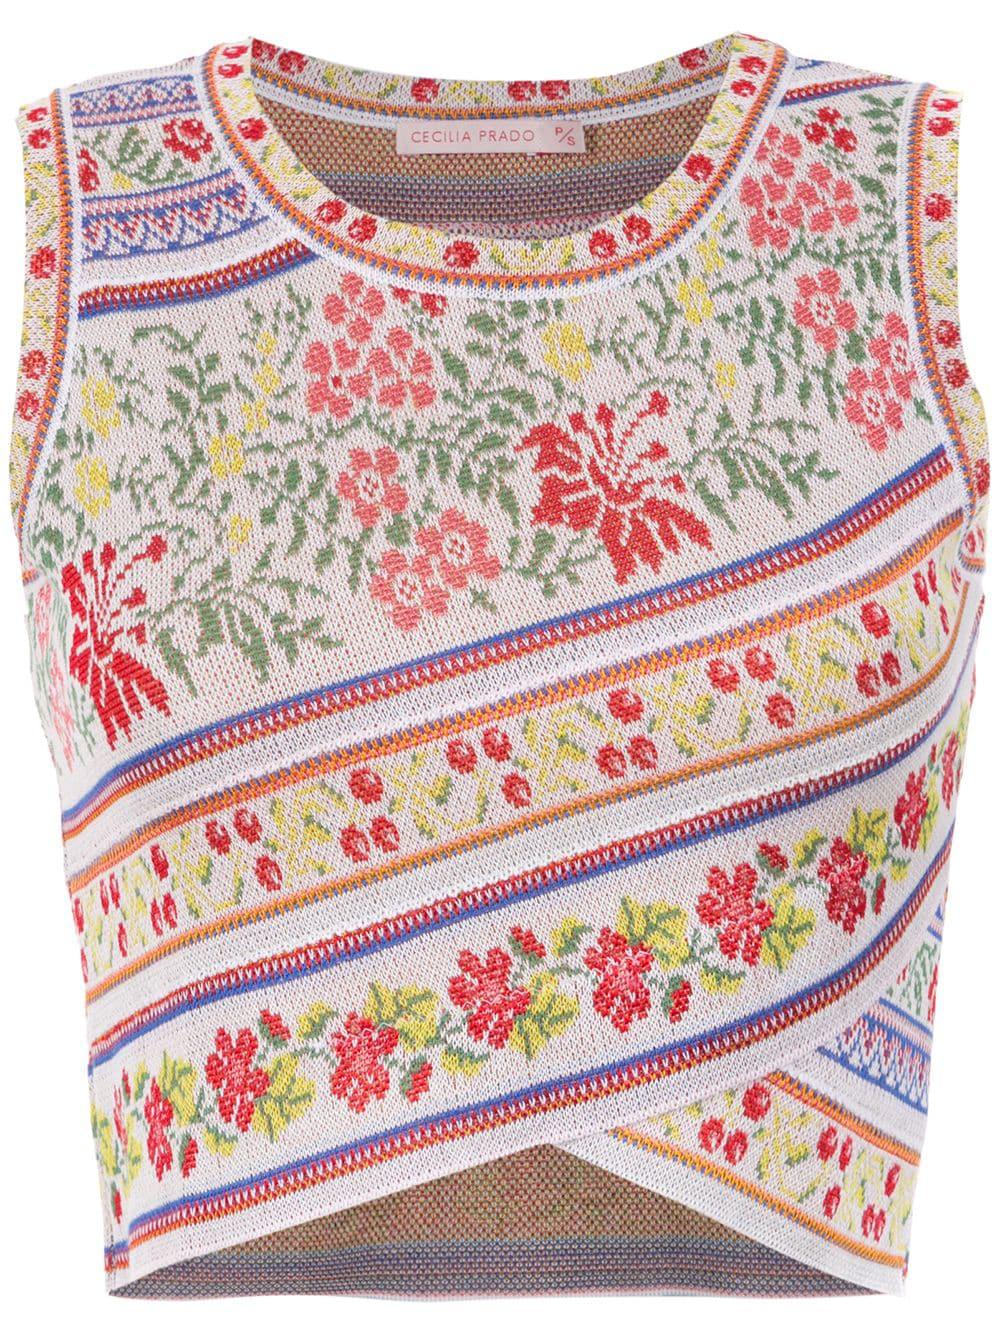 44cf6a13446fae Cecilia Prado Adele Cropped Top - White | ModeSens